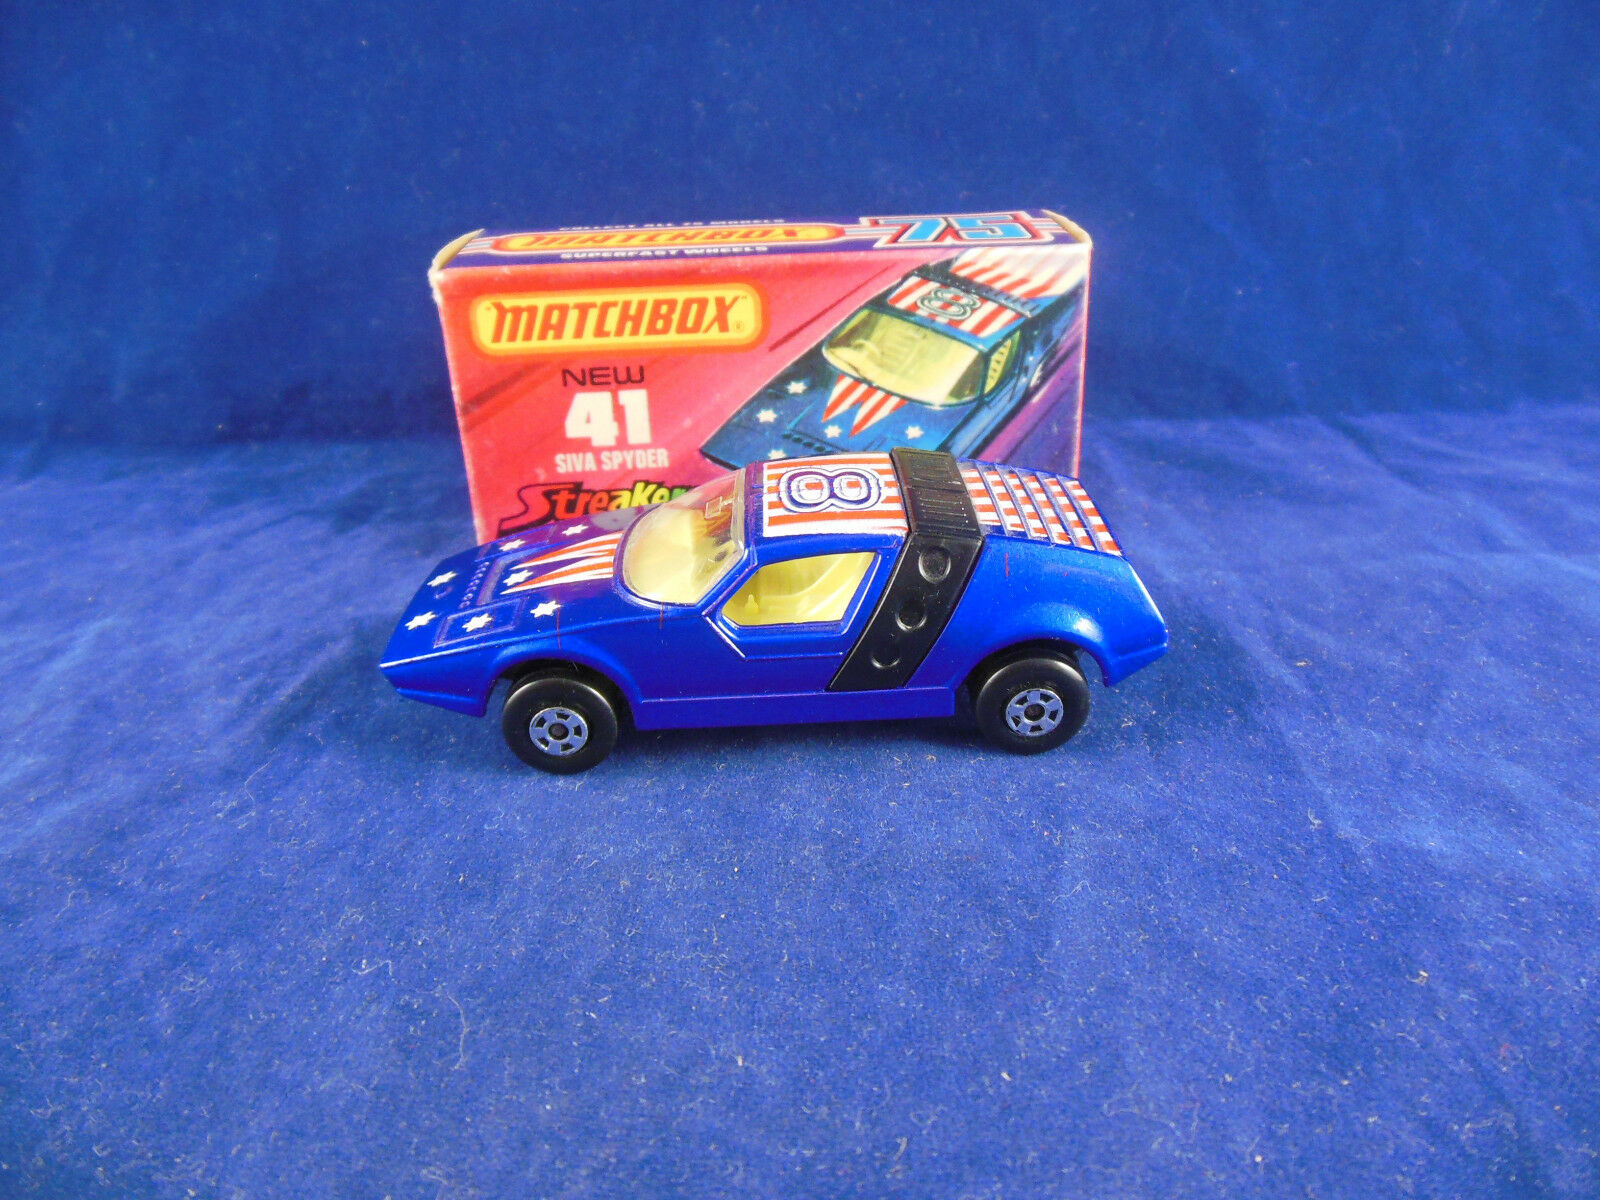 Matchbox Superfast MB - 41 41 41 b Siva Spyder Streakers in Dark Metallic bluee RN 8 f8c93c